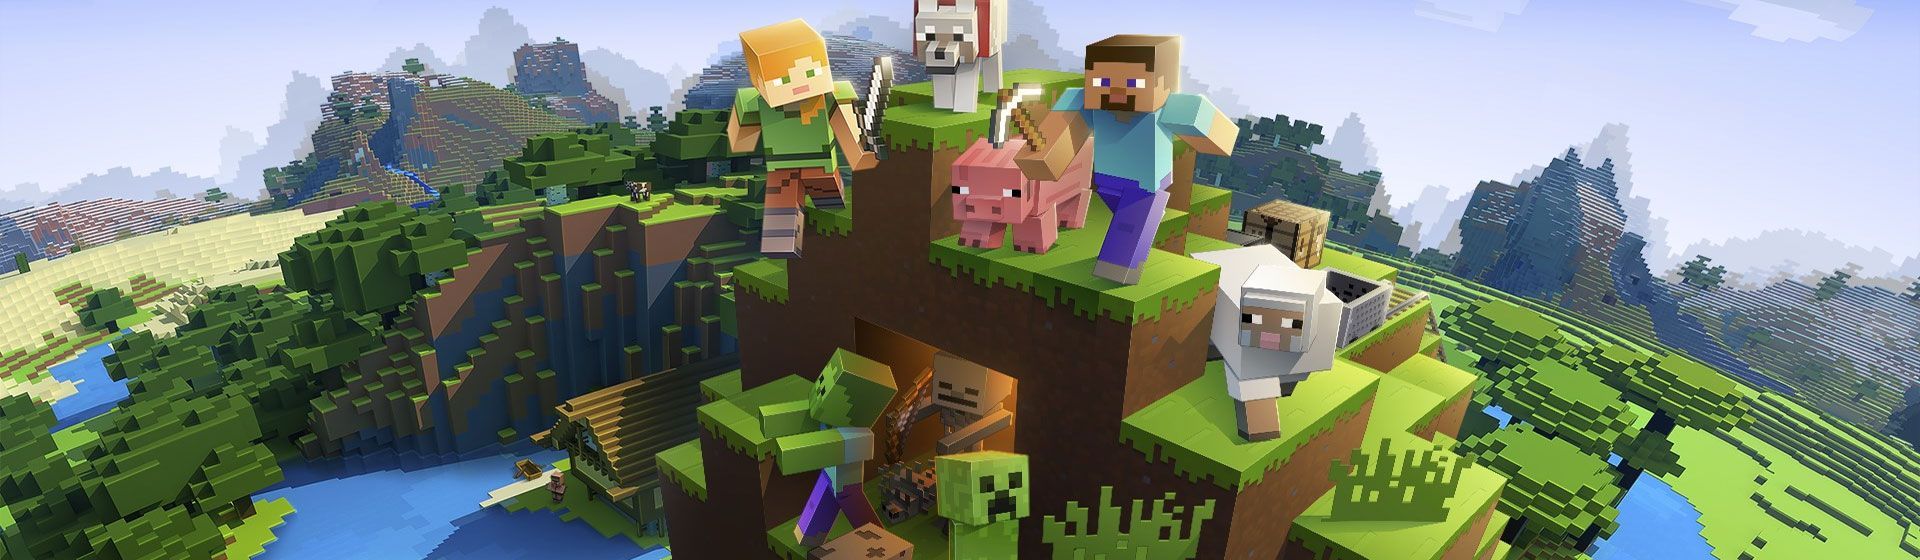 Minecraft: tudo sobre o jogo no Xbox One, PS4, Switch, PC, Android e iPhone